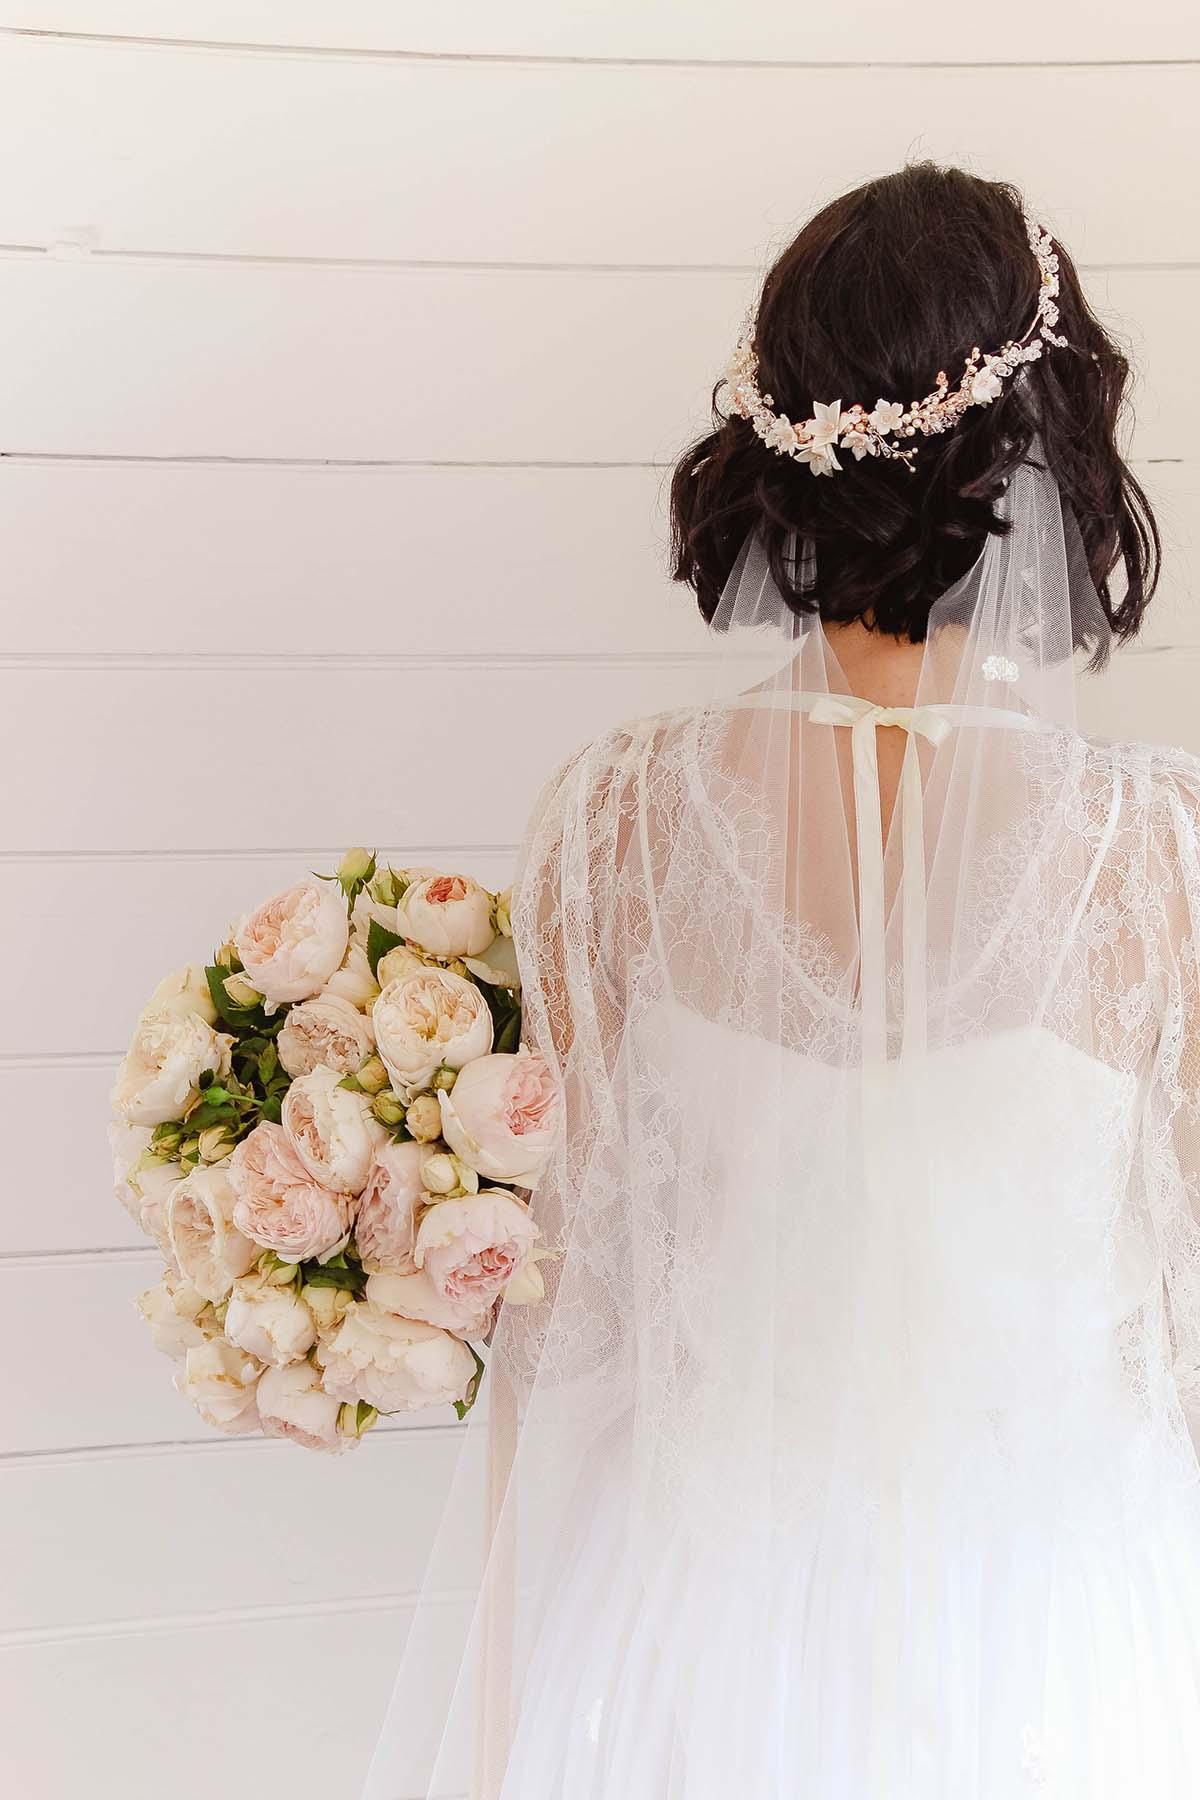 Rose gold floral wedding crown gwenonwy all about romance rose gold floral wedding crown gwenonwy izmirmasajfo